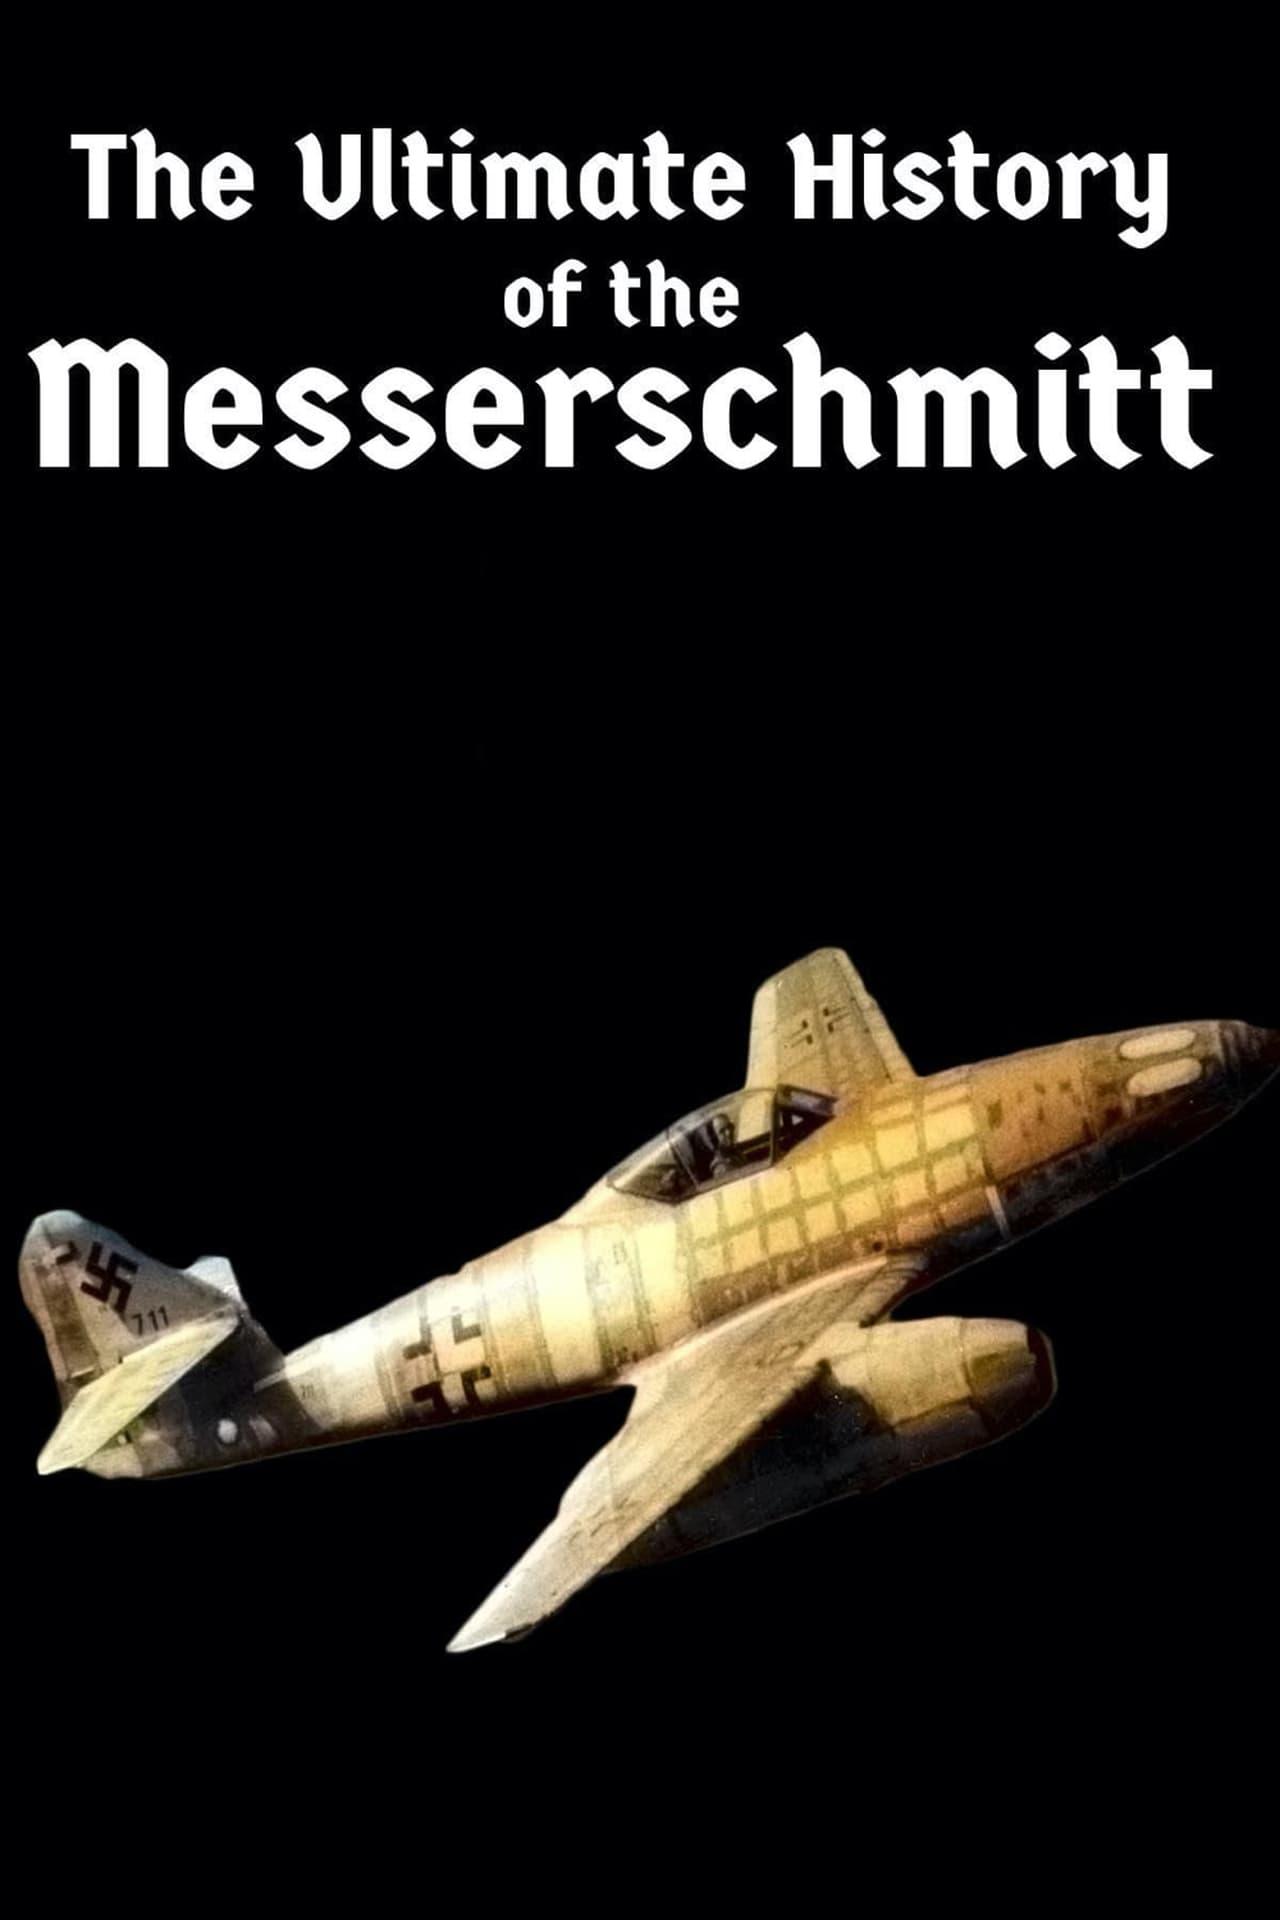 The Ultimate History of the Messerschmitt